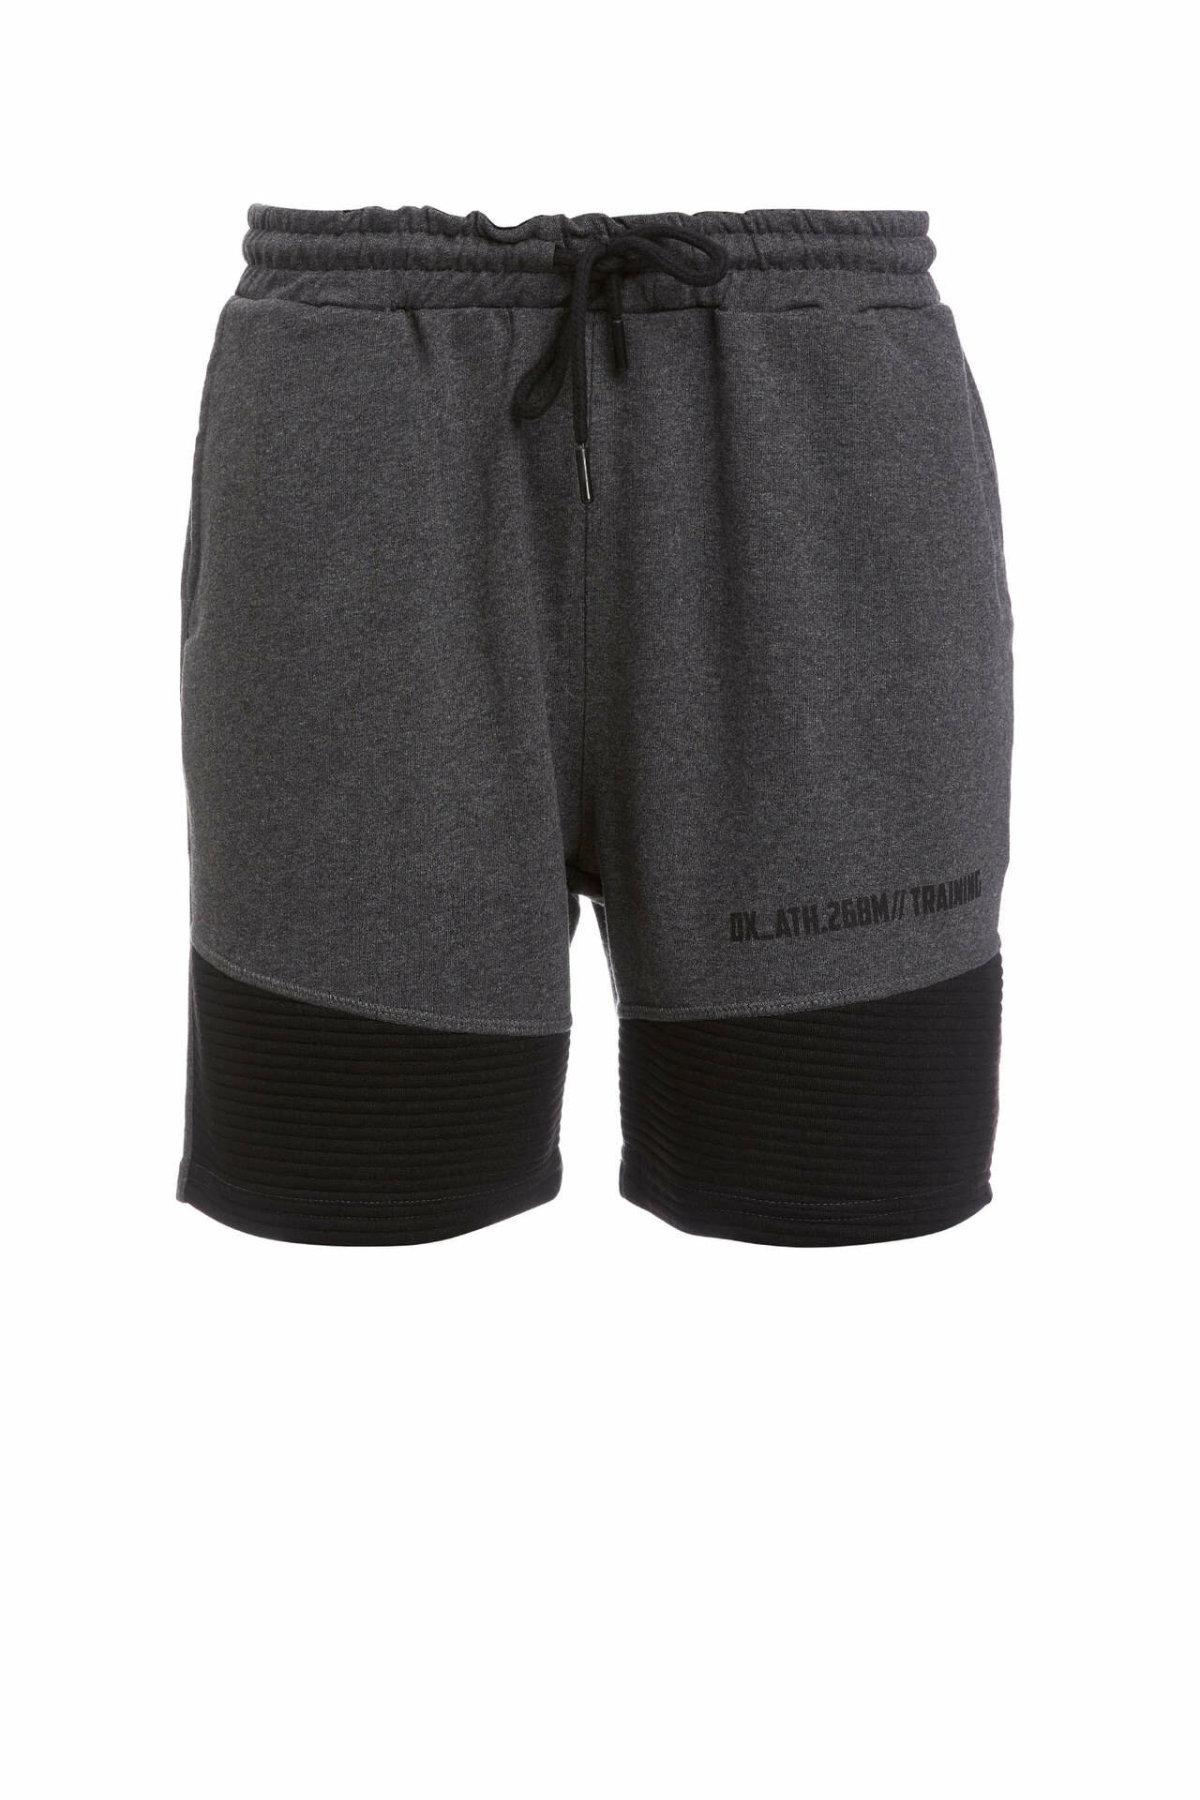 DeFacto Man's Casual Short Men's Dark Grey Short Bottoms Men's Summer Lace-up Shorts Men Short Pants-R2359AZ20SM